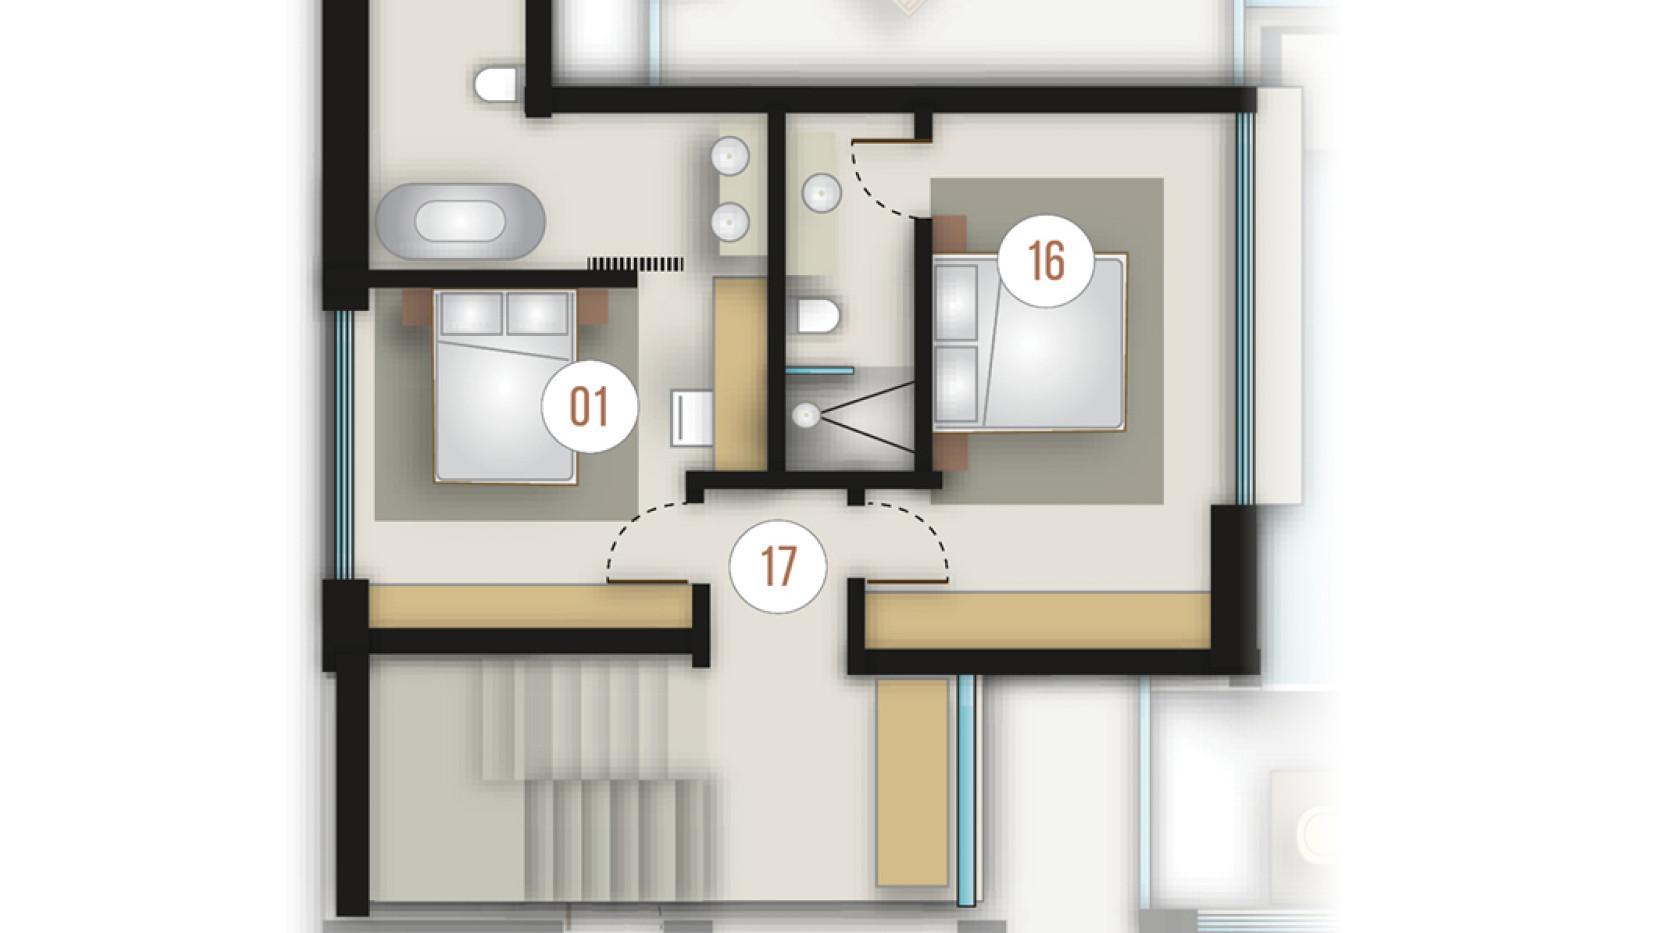 Villa 2b - 4 bedrooms